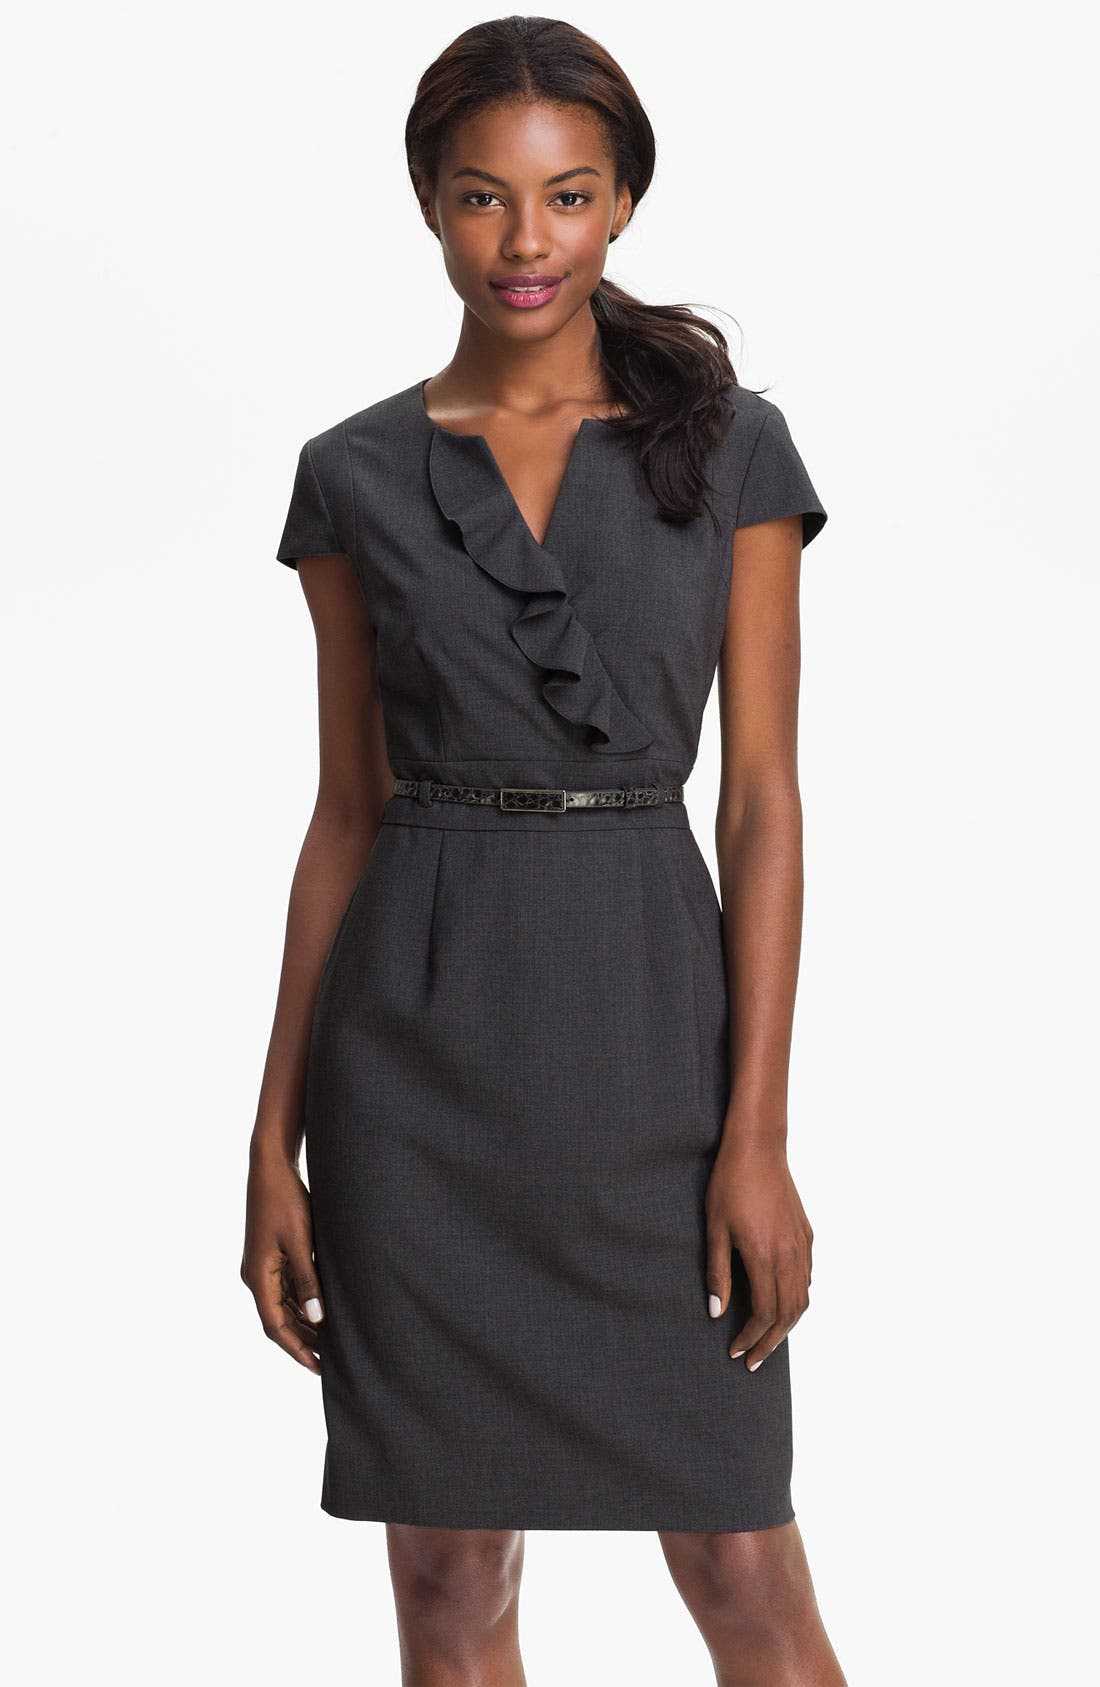 Alternate Image 1 Selected - Tahari 'Shelly' Ruffle Front Belted Sheath Dress